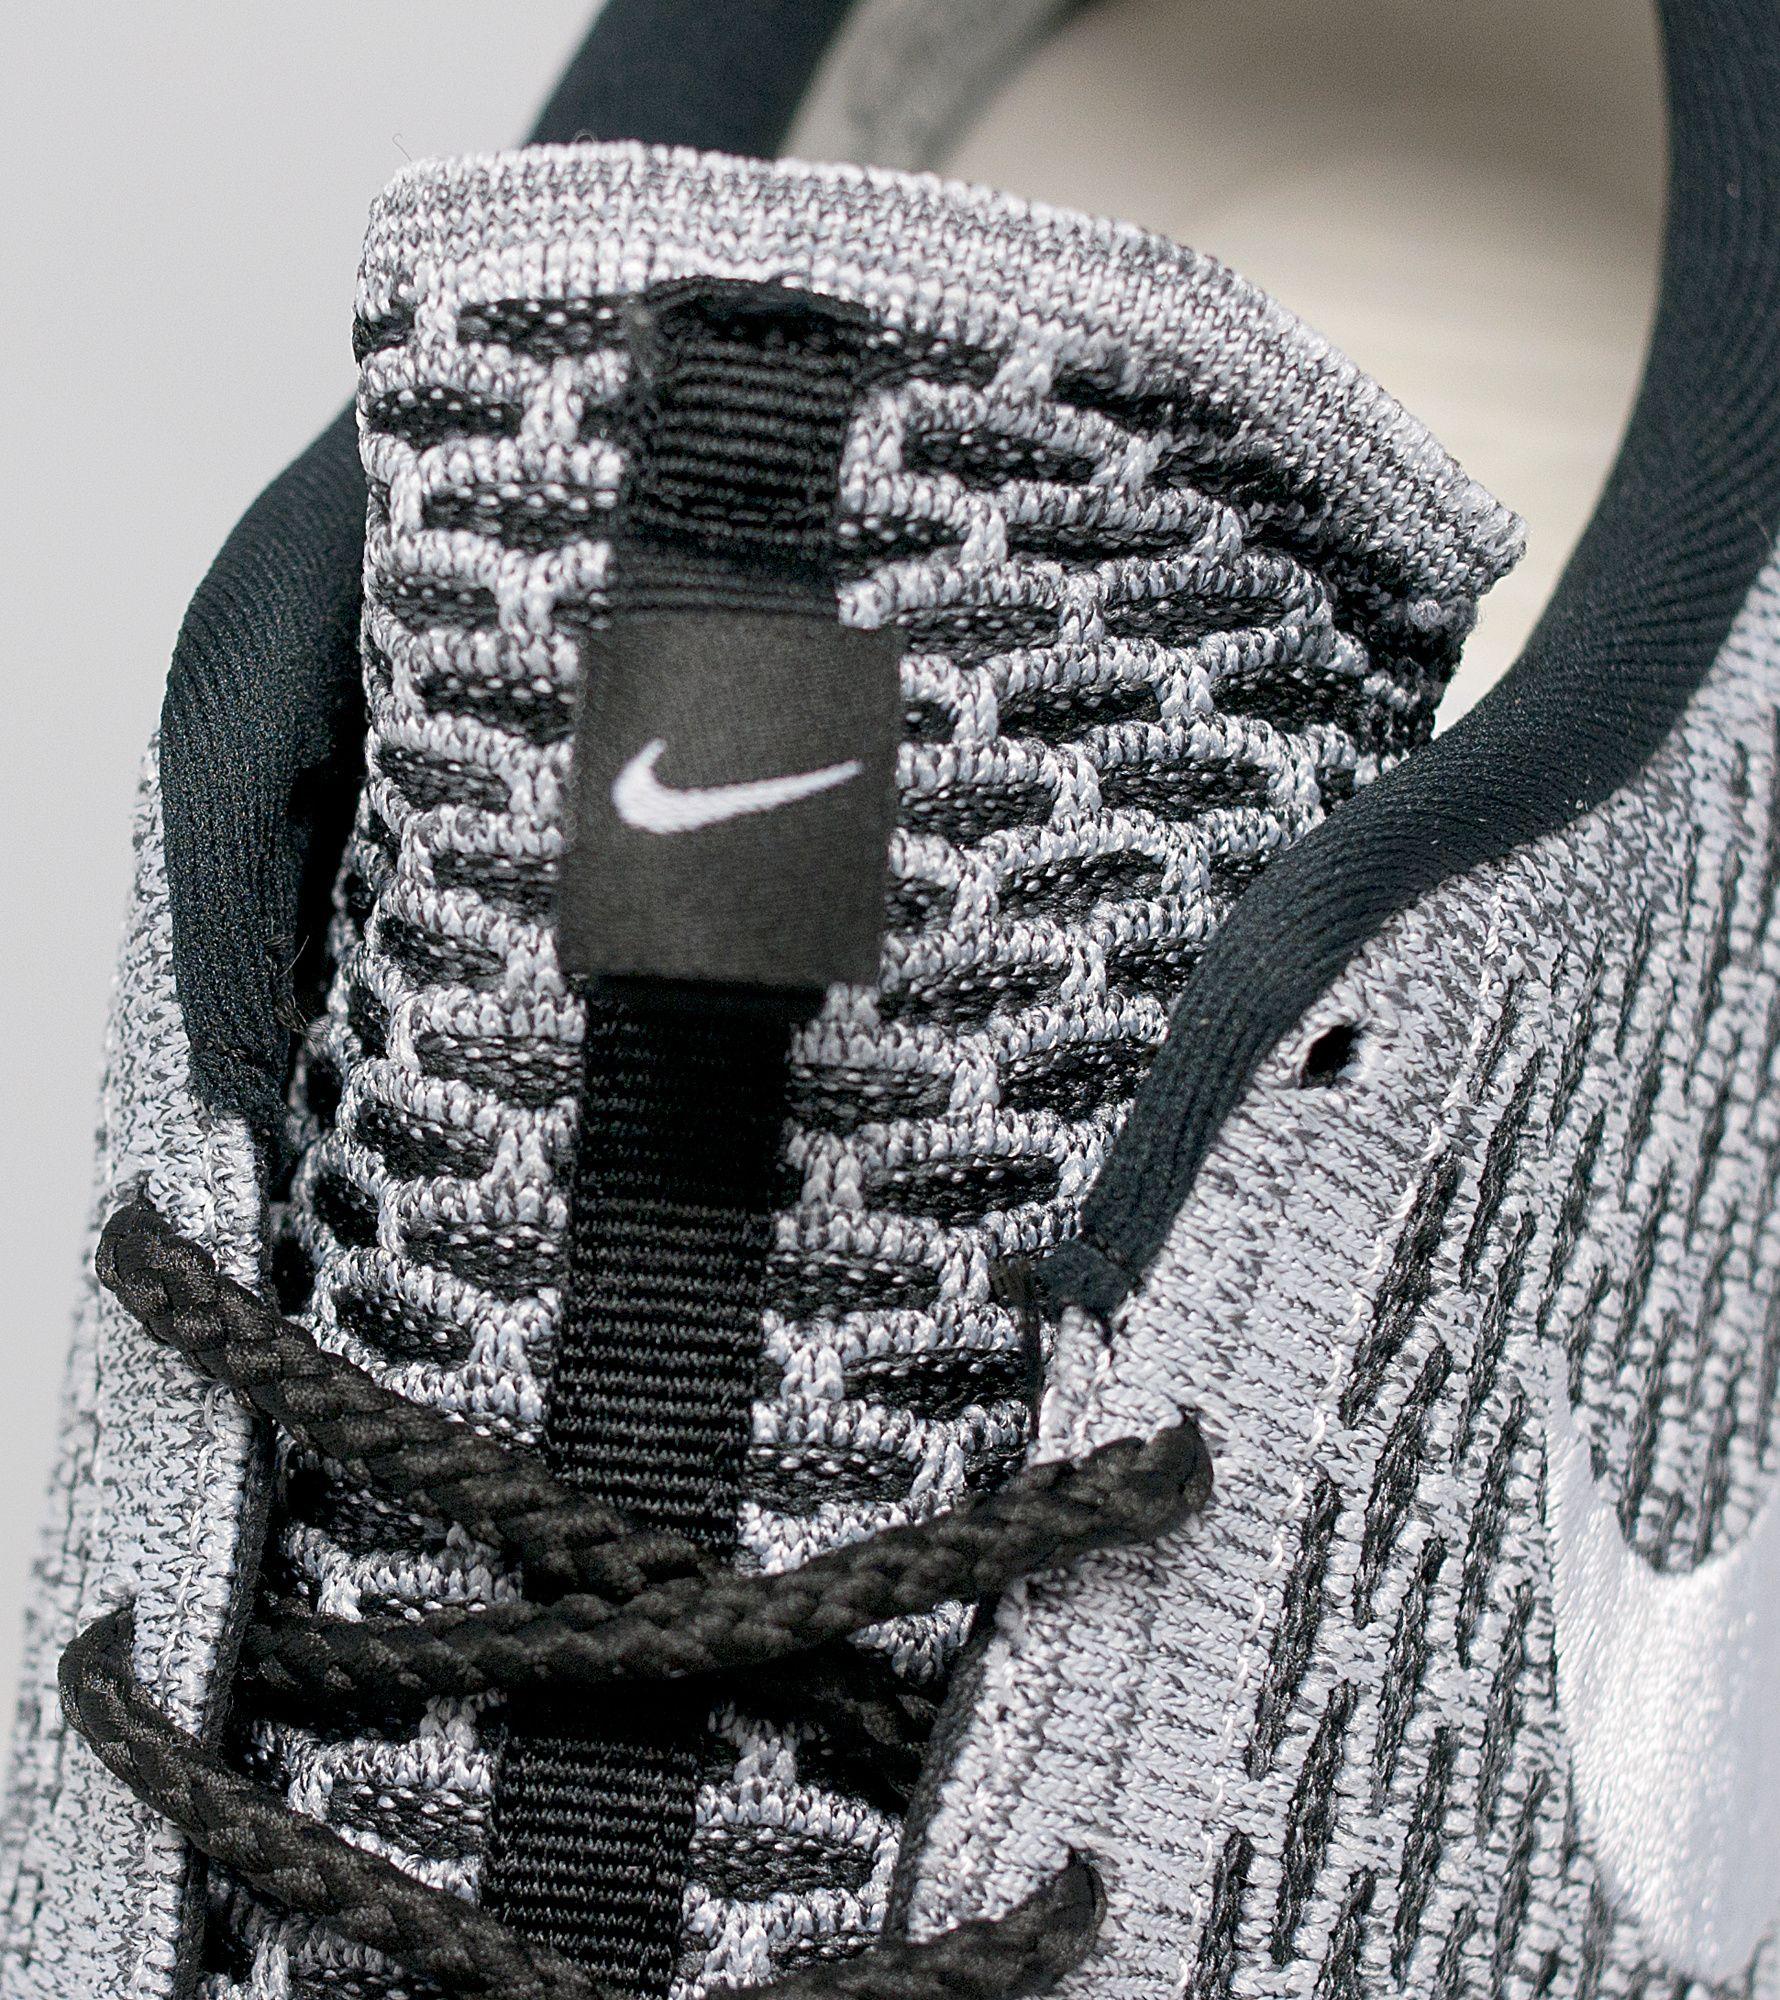 yqhmw Nike Roshe One Flyknit | Size?